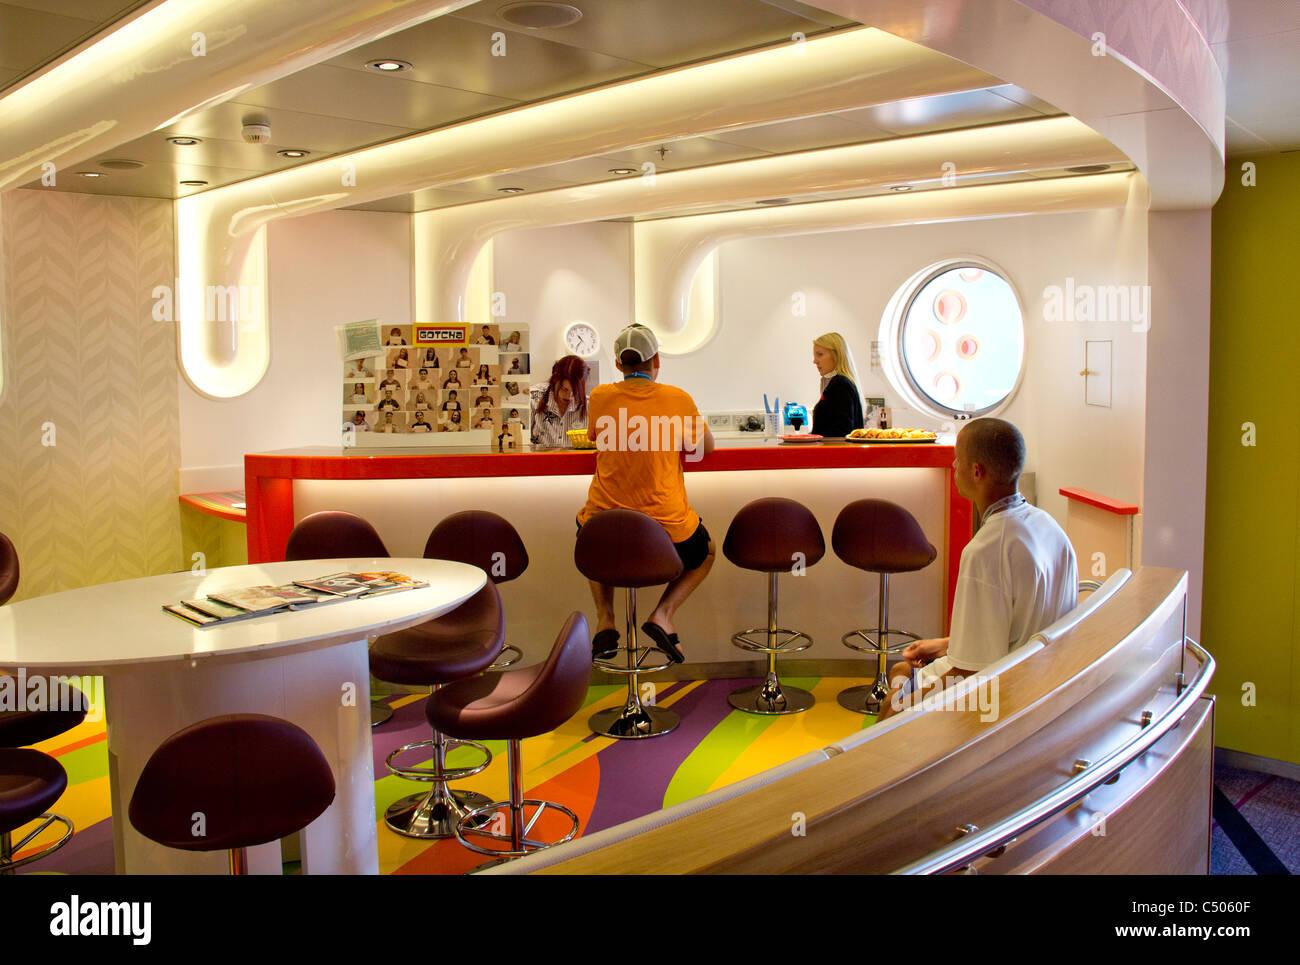 Vibe, a teen club on Disney Dream cruise ship - Stock Image